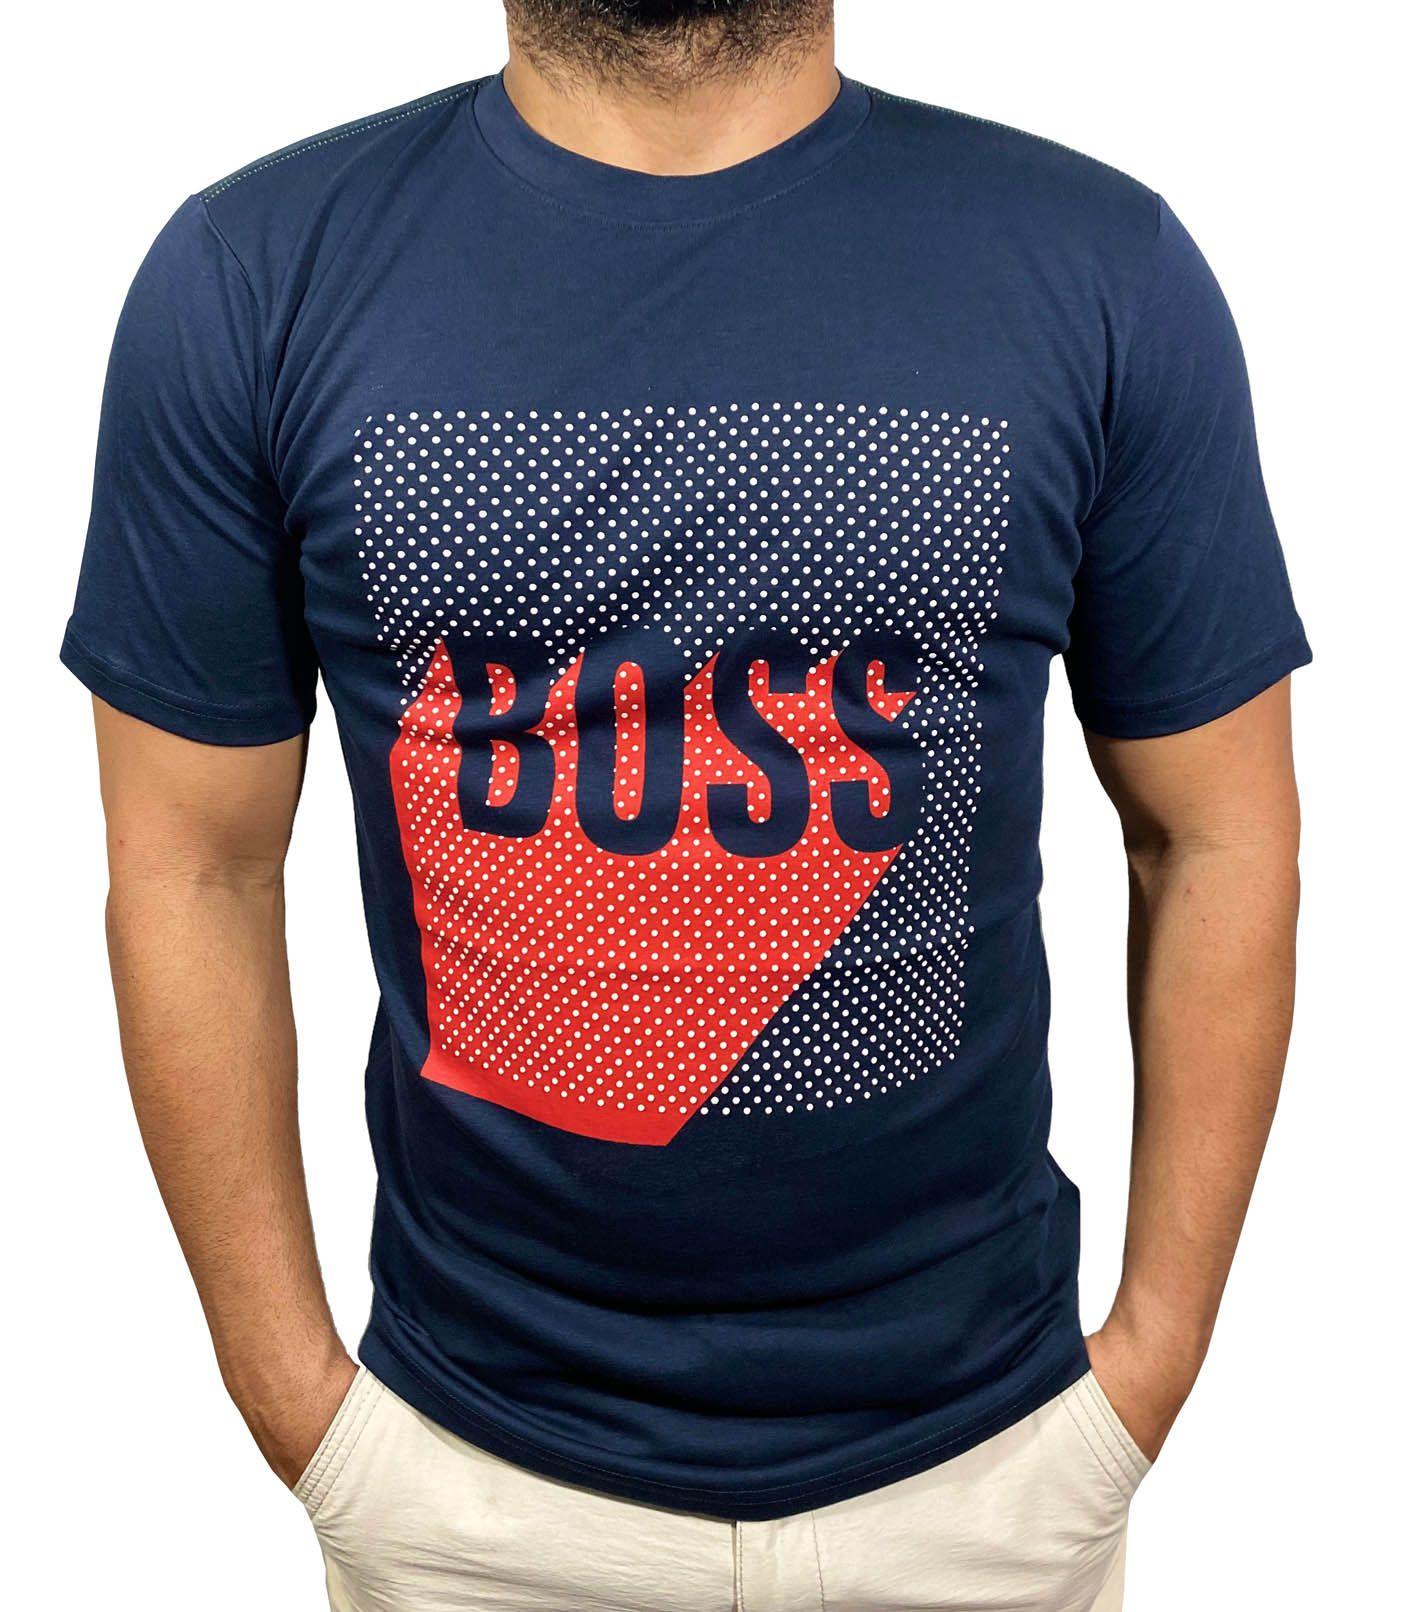 Camiseta HB Marinho - 02 Slim Fit  - Ca Brasileira